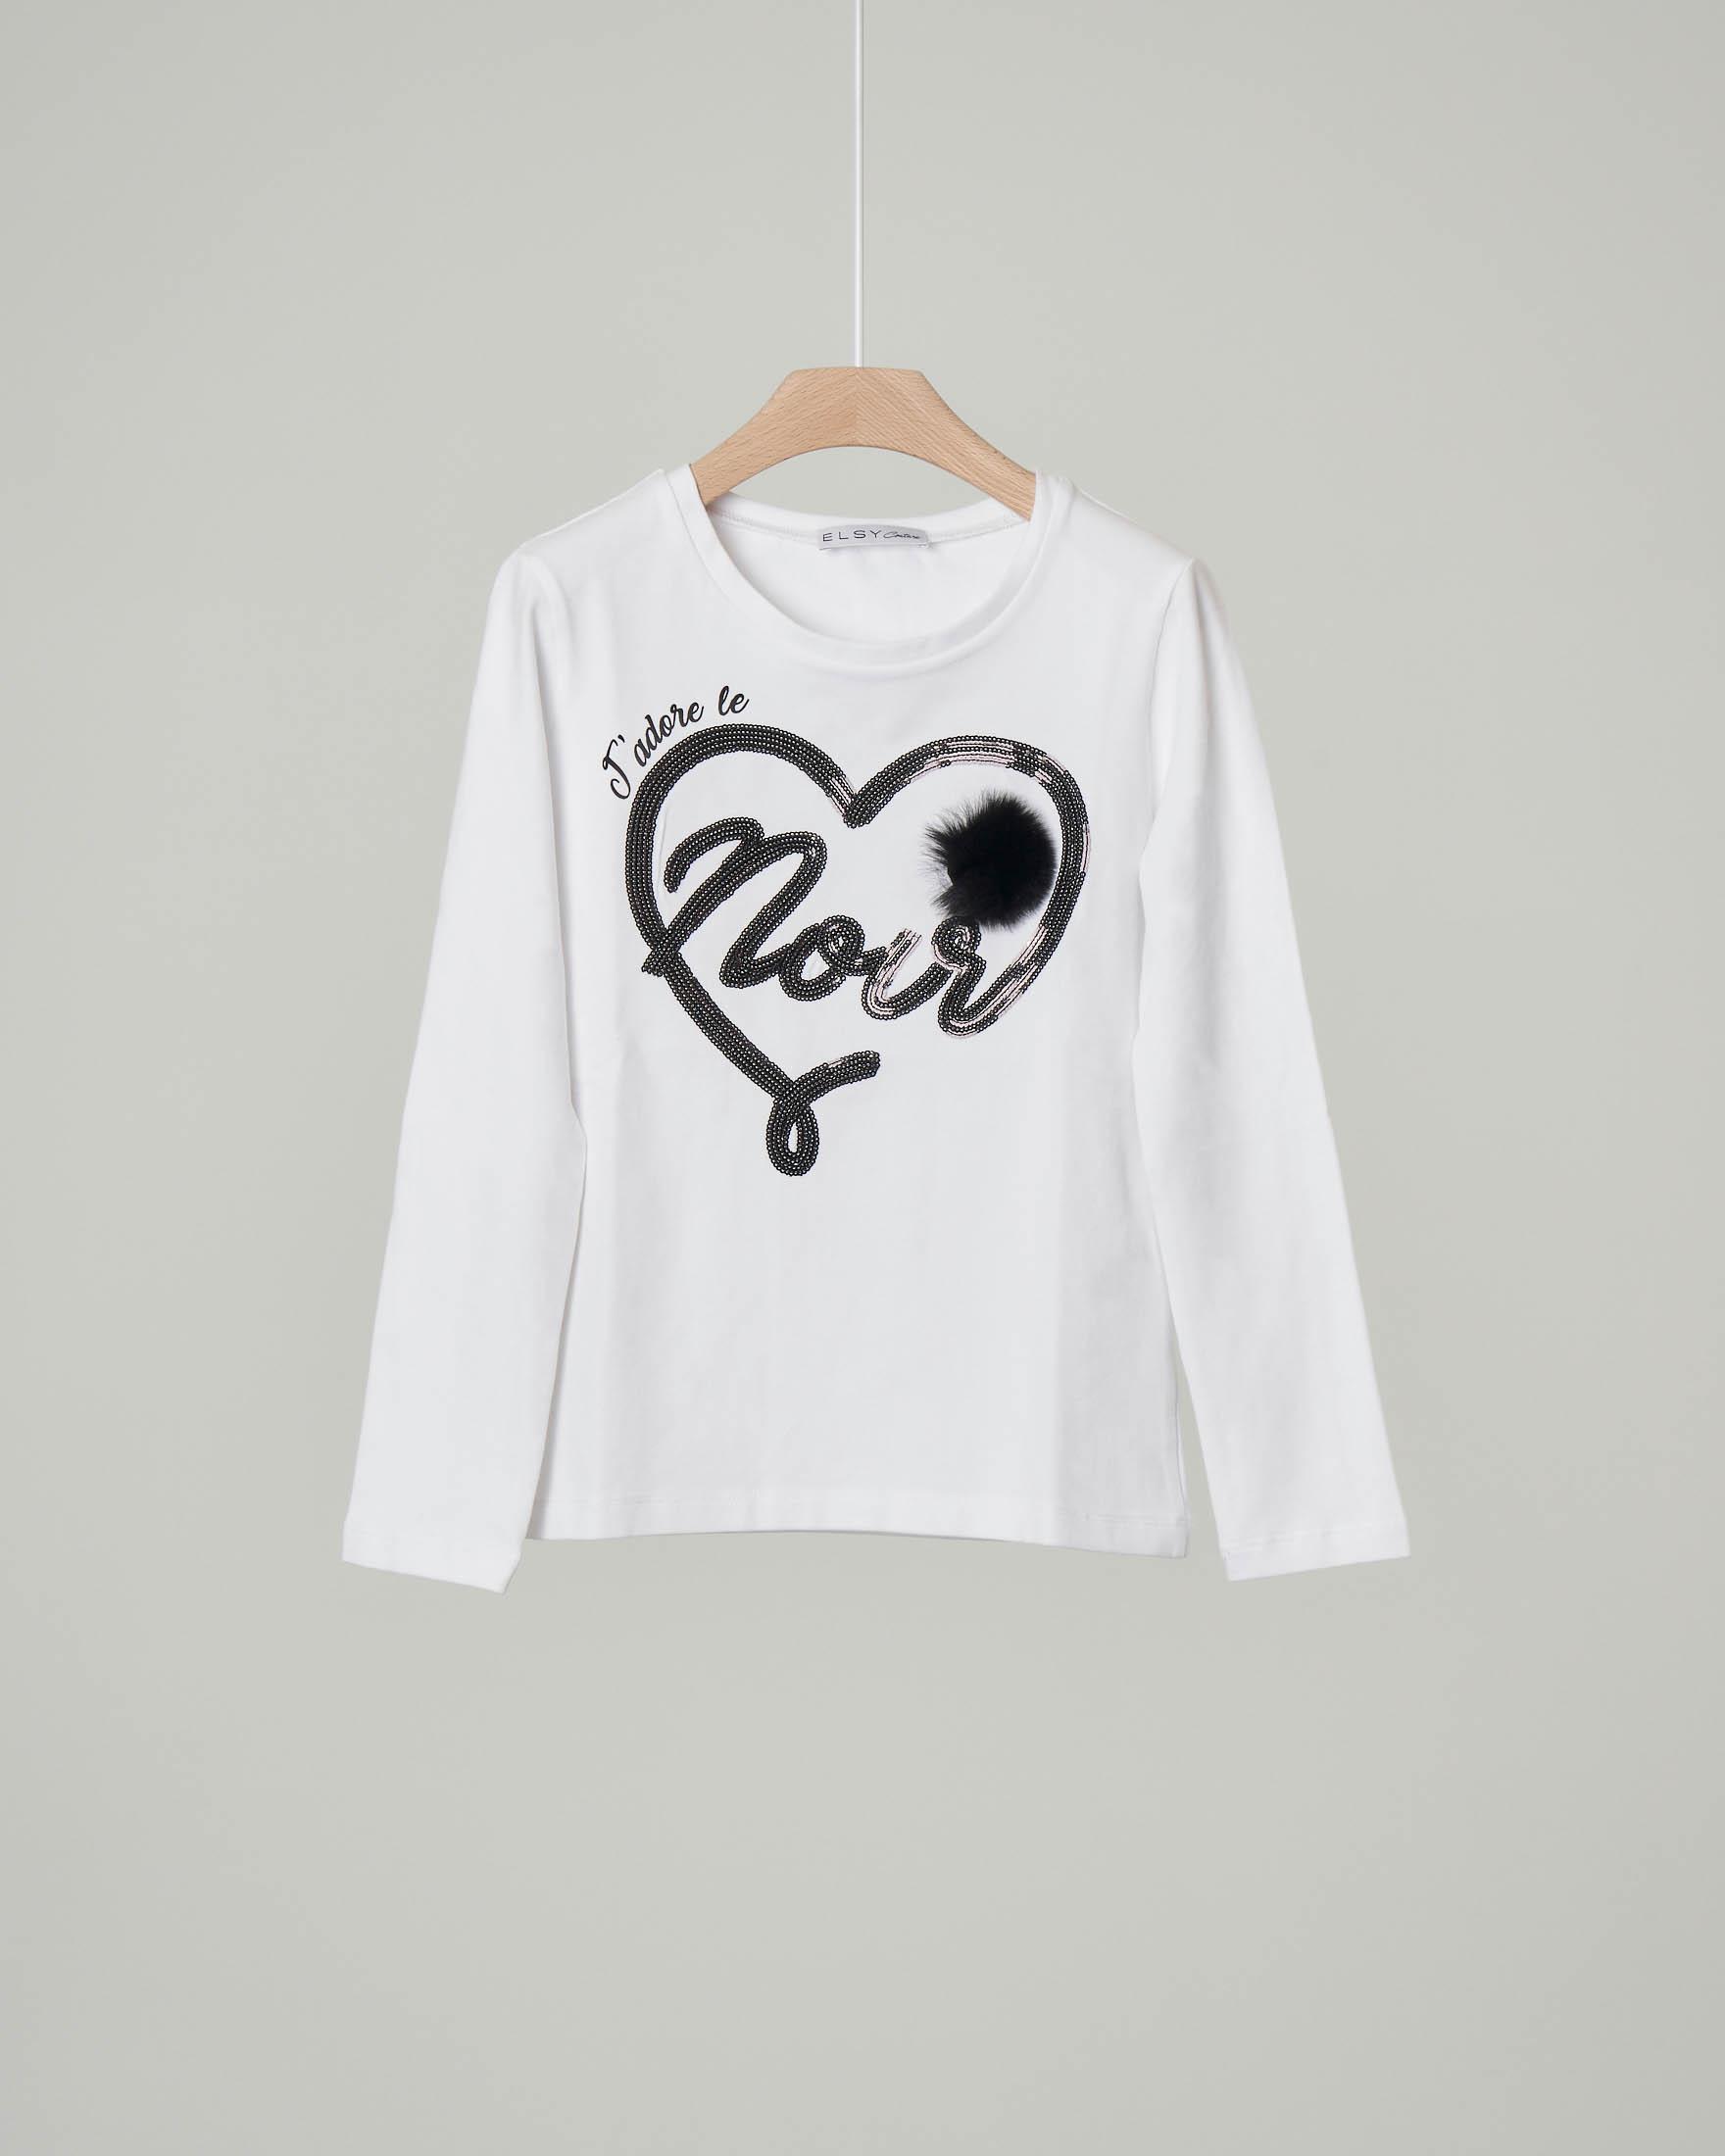 T-shirt bianca manica lunga con cuore e pon-pon nero 32-36